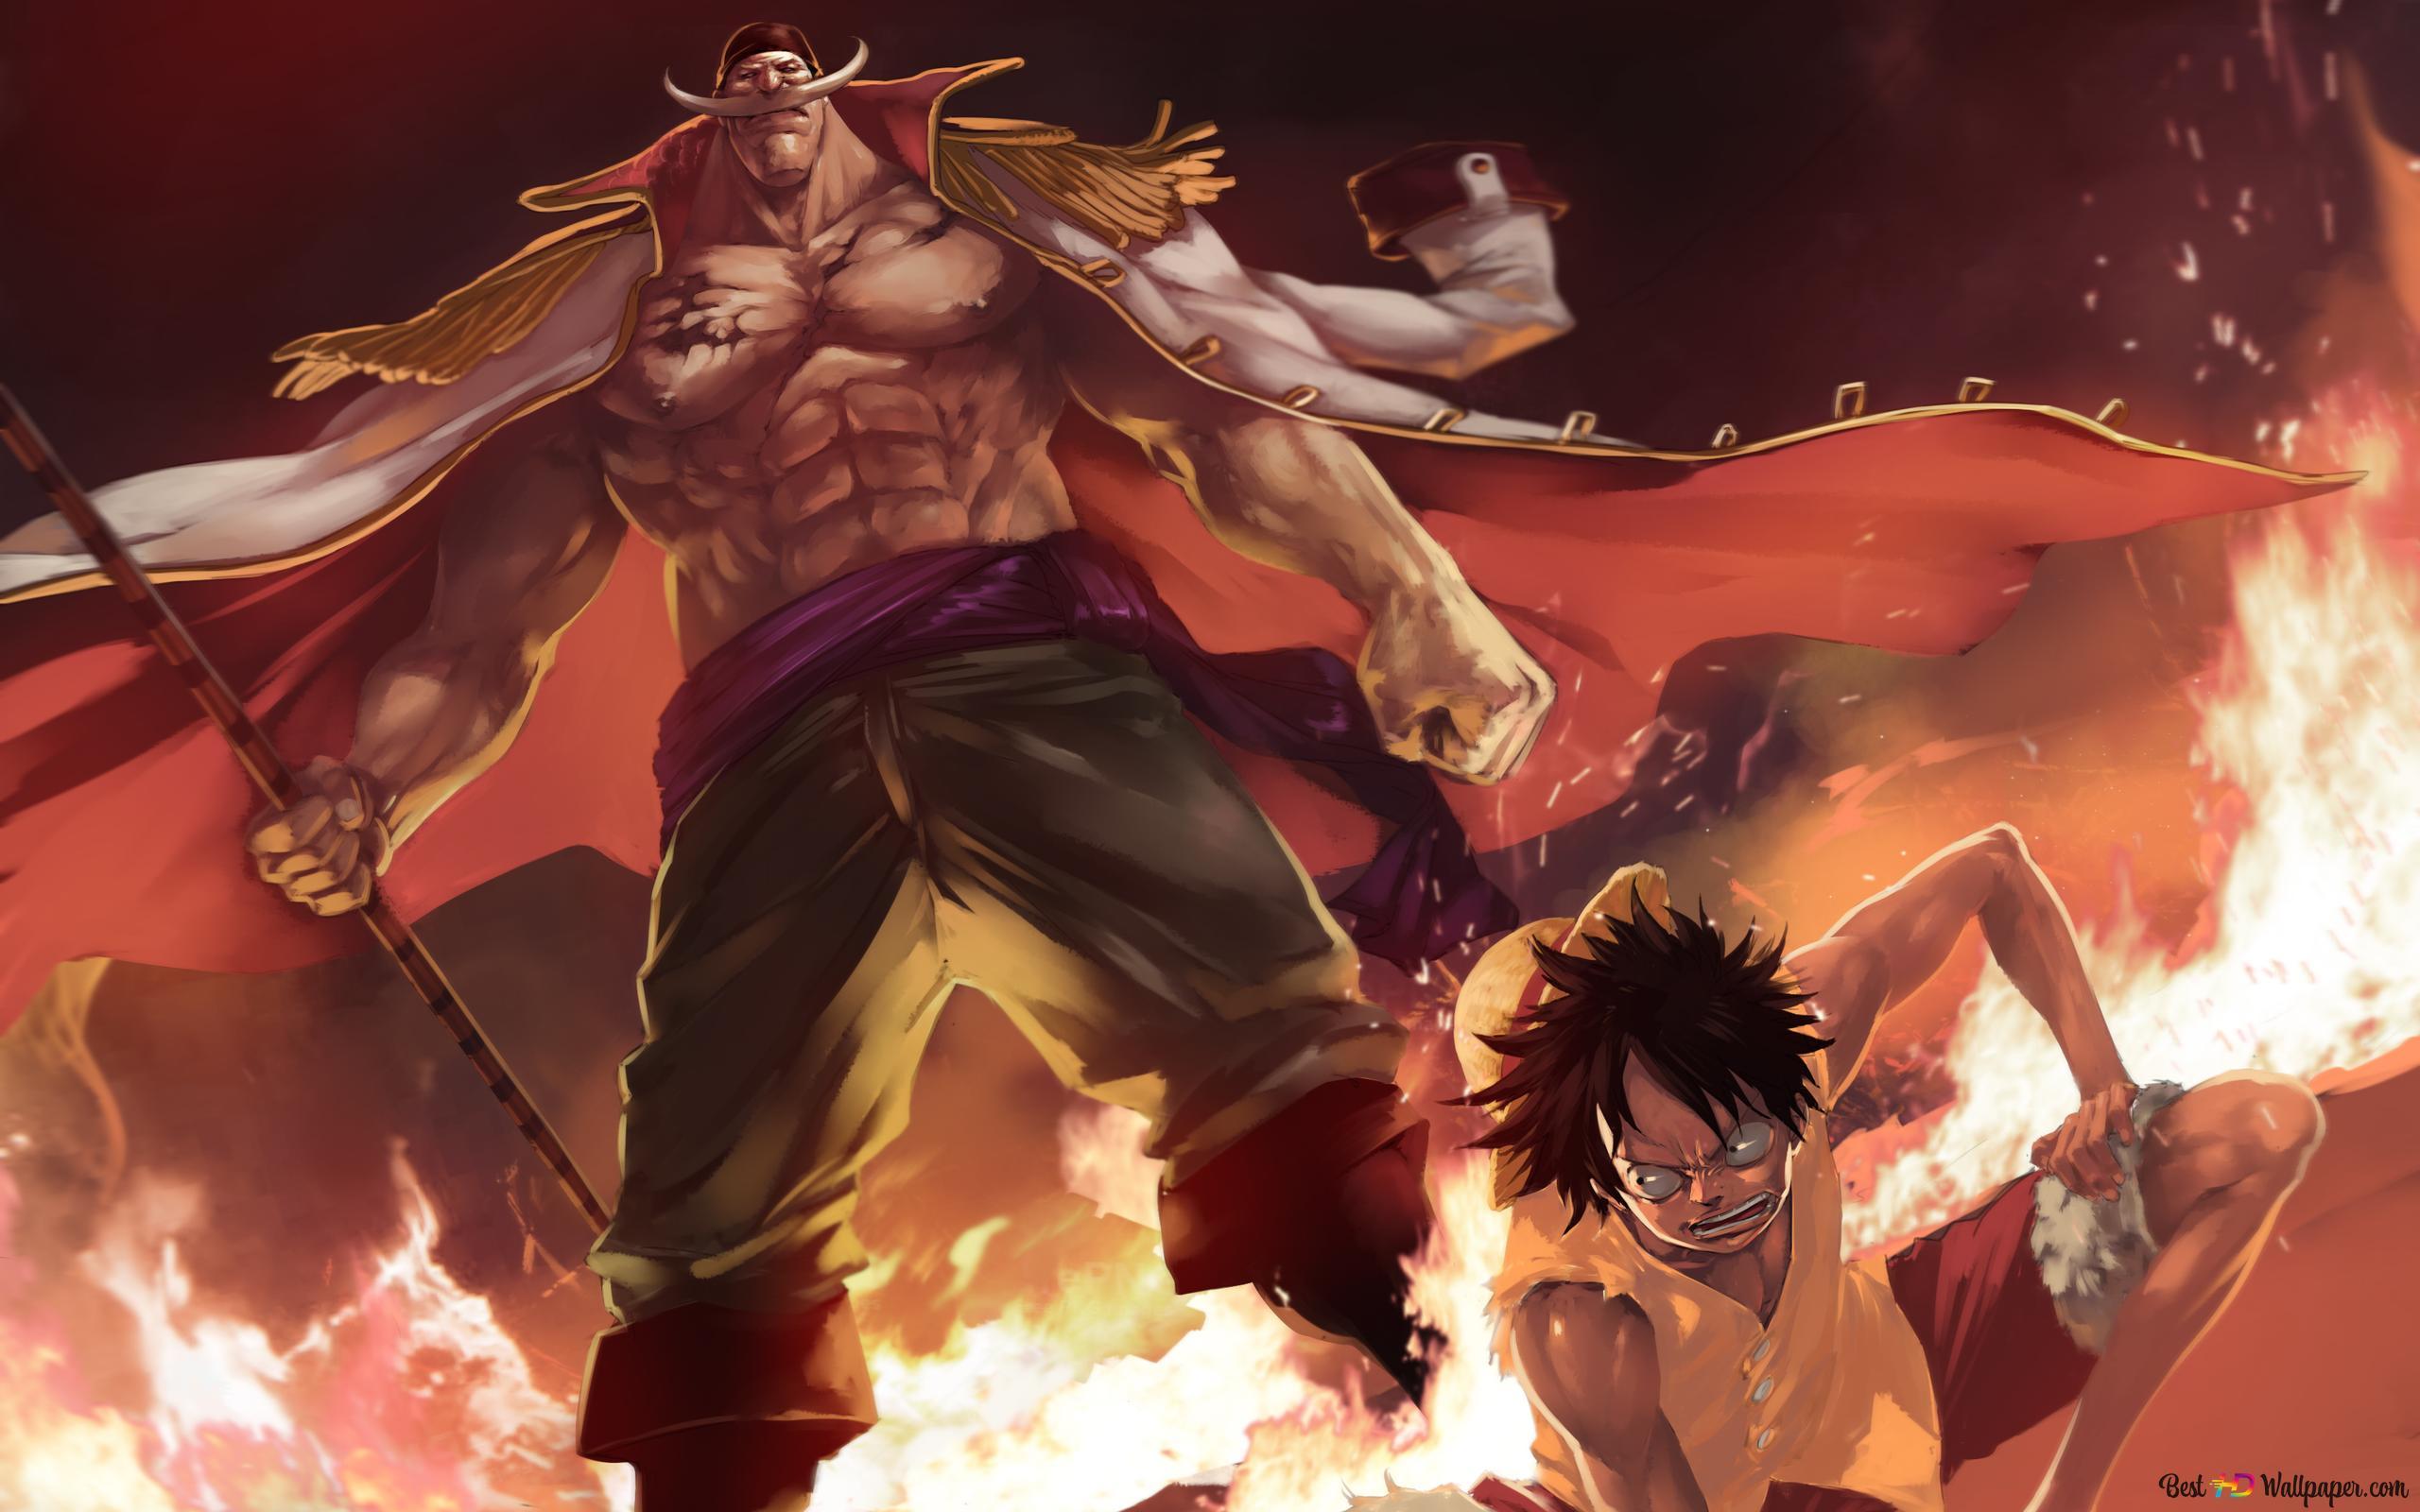 One Piece - Edward Newgate, Monkey D. Luffy, Blanchebarbe HD fond d'écran télécharger